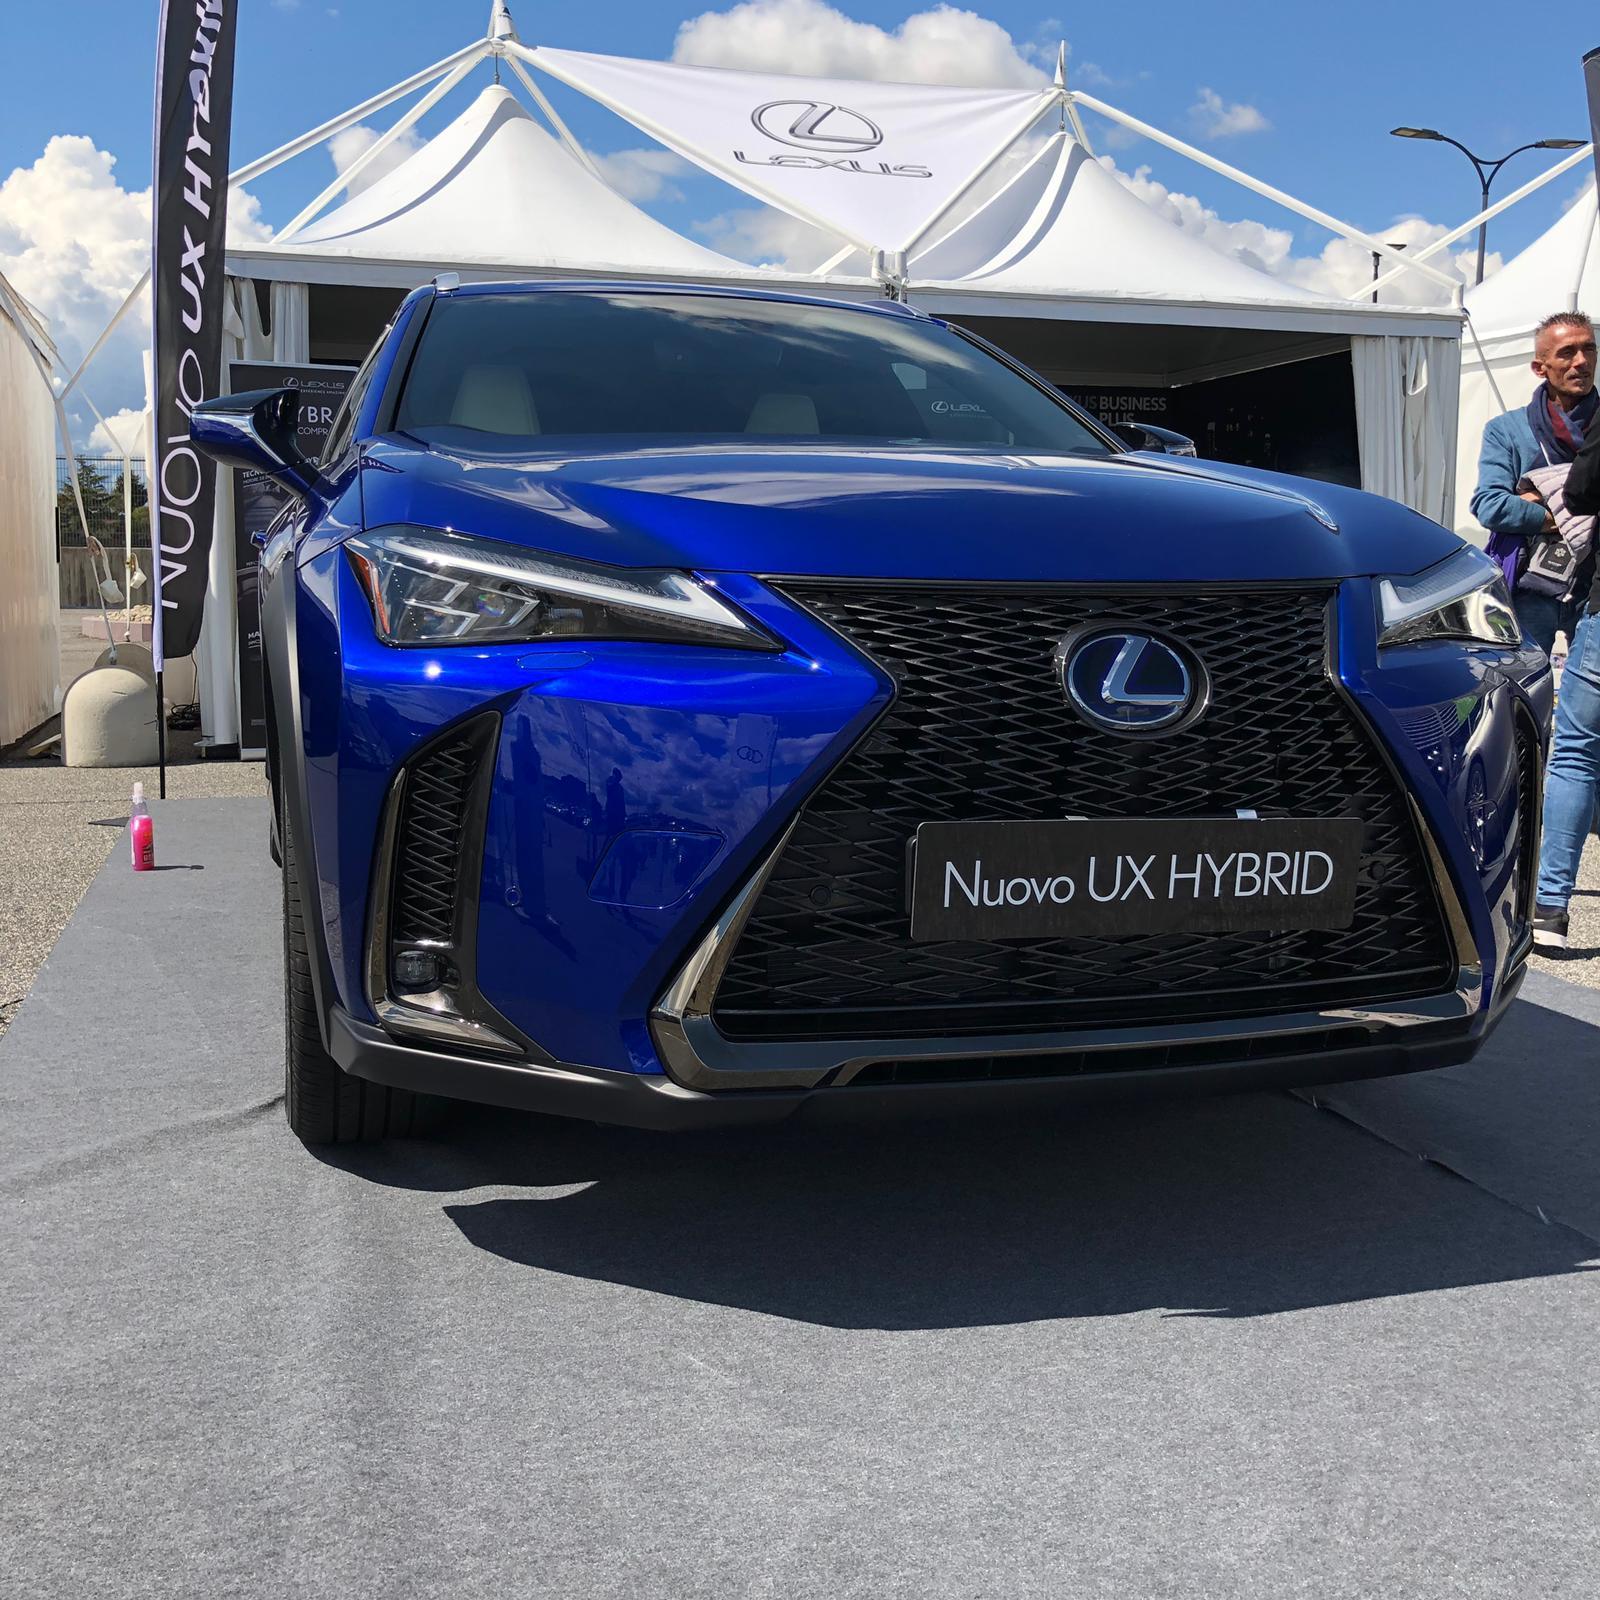 lexus-ux-hybrid-fleet-motor-day-2019